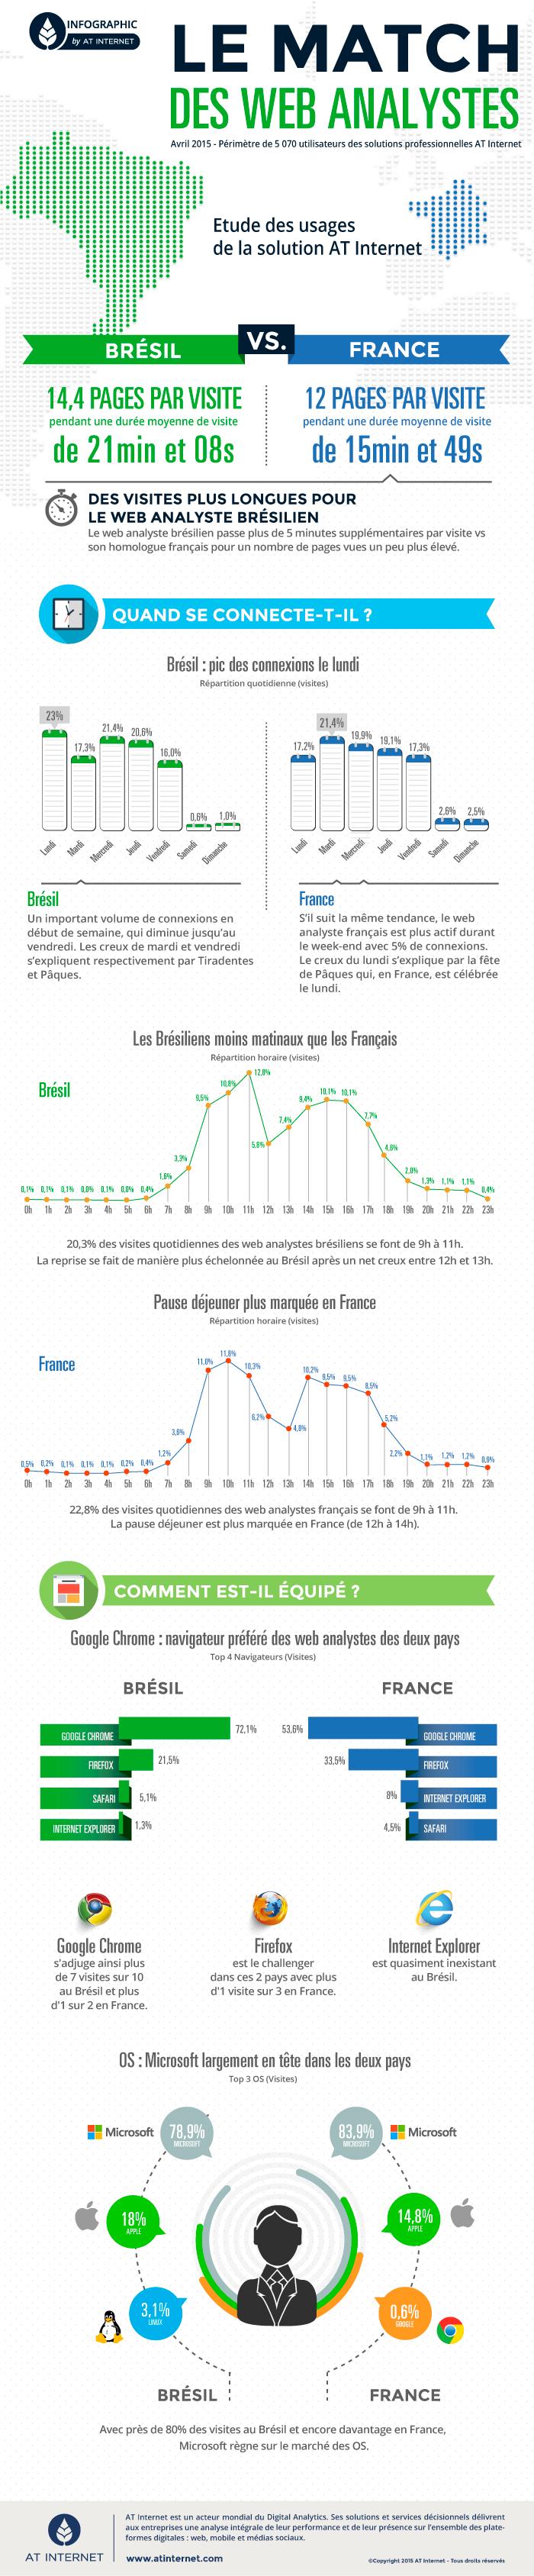 Infographie_Match_BrésilvsFrance_FR